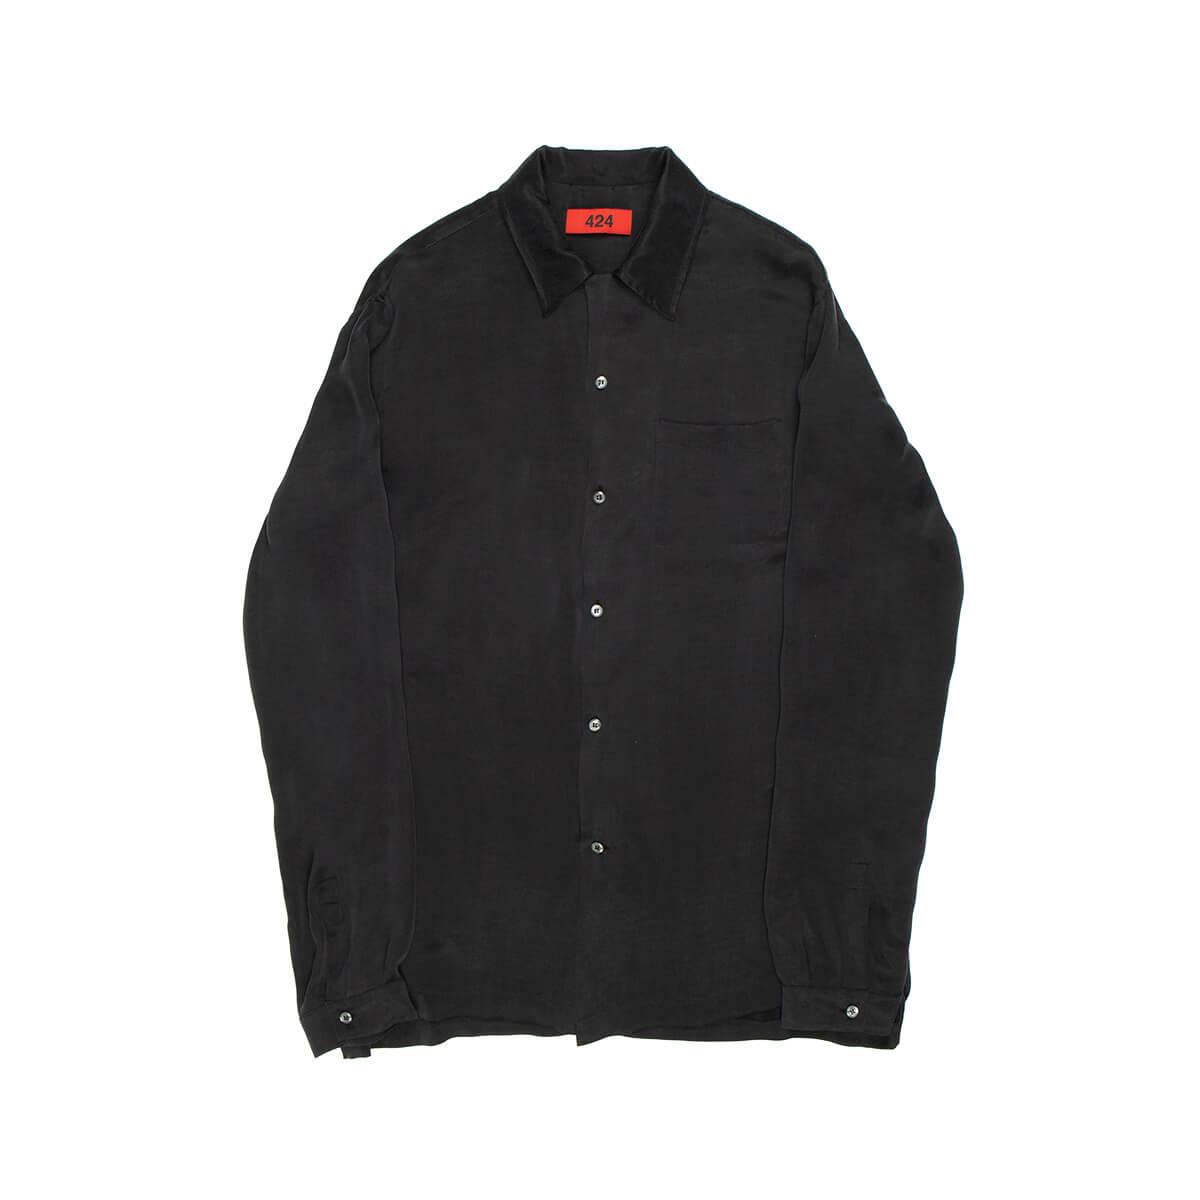 Mimic Shirt